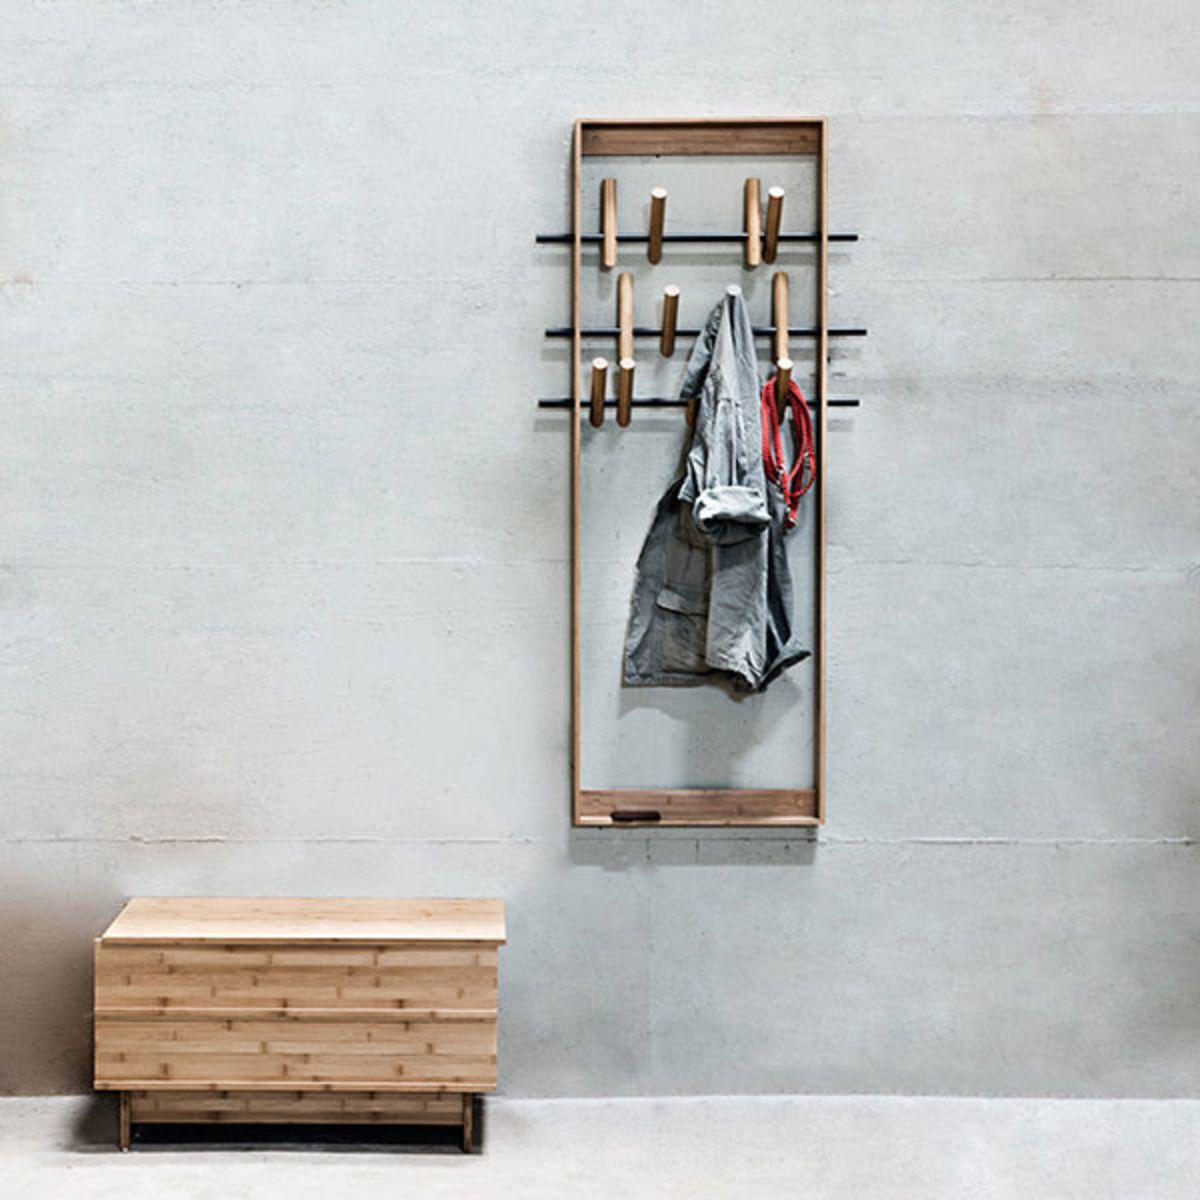 Appendiabiti Coat Frame by We do wood